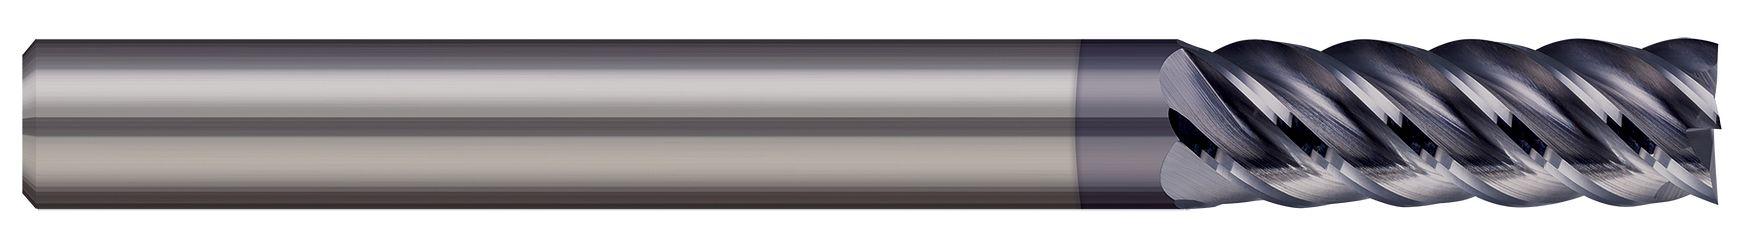 tool-details-ARMM-160-5X